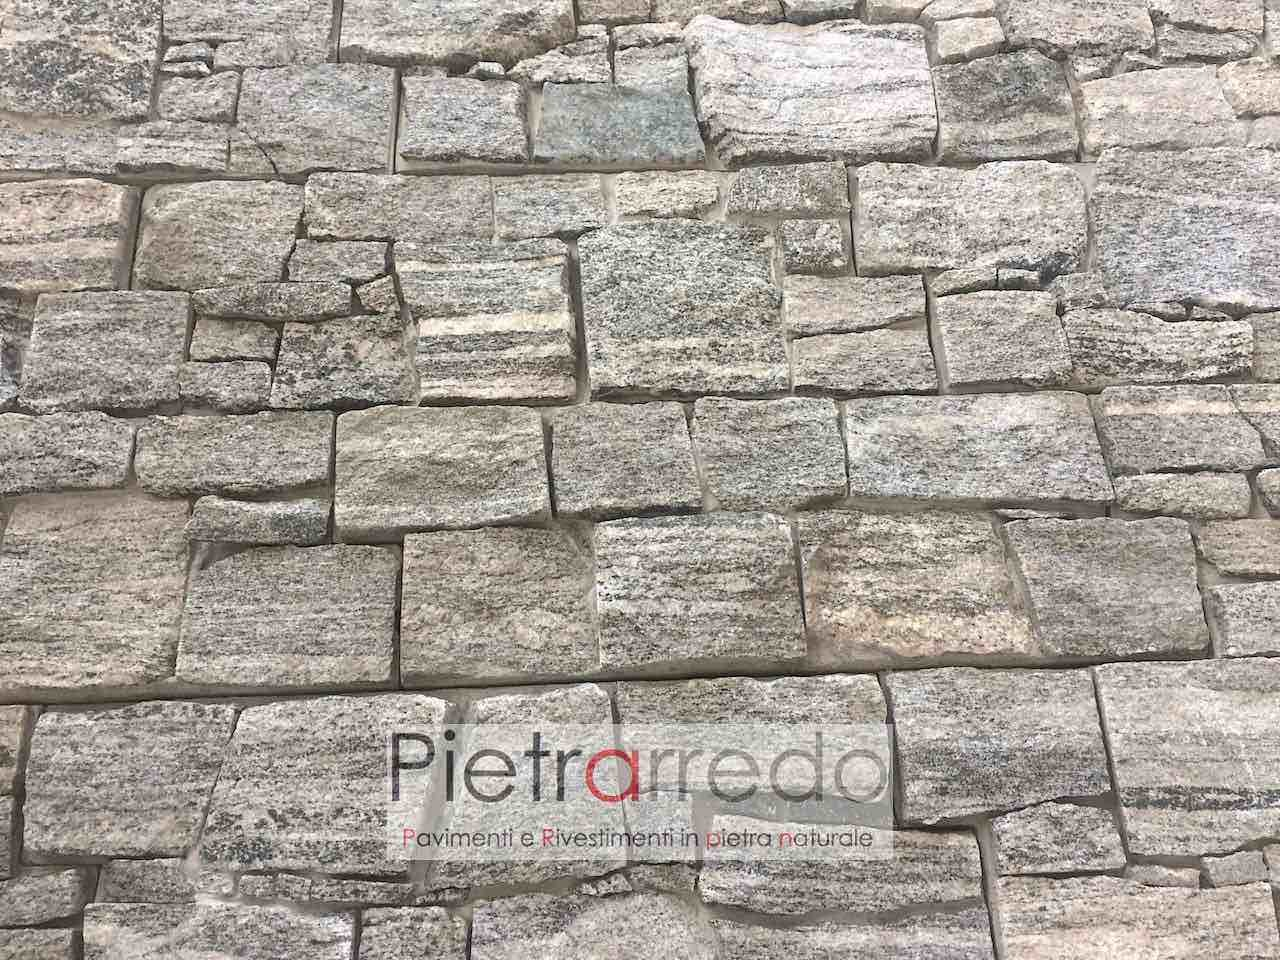 Rivestimento Pietra Beola Grigia -50% - Pietrarredo- OFFERTA €85/MQ